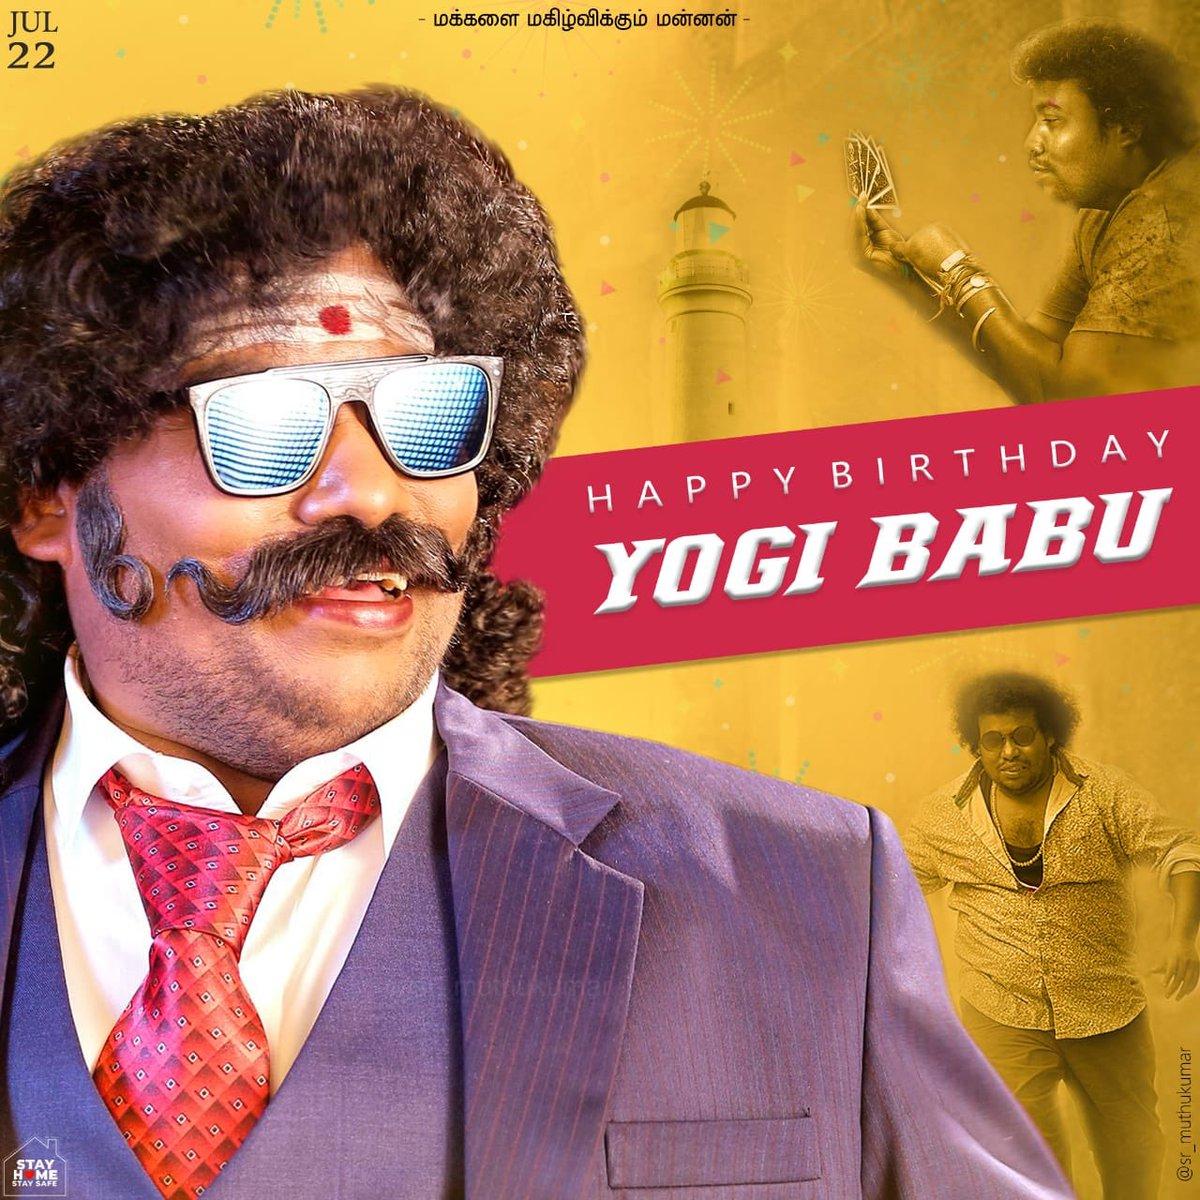 Happy to Release Common DP for Actor @iYogiBabu Birthday Celebration #YogiBabu  Design by - @sr_muthukumar  Organised by - @FXSHARAN  #HBDYogiBabu #YogibabuBirthdayCDP  #NM #News23 https://t.co/4oJx7jz6eB